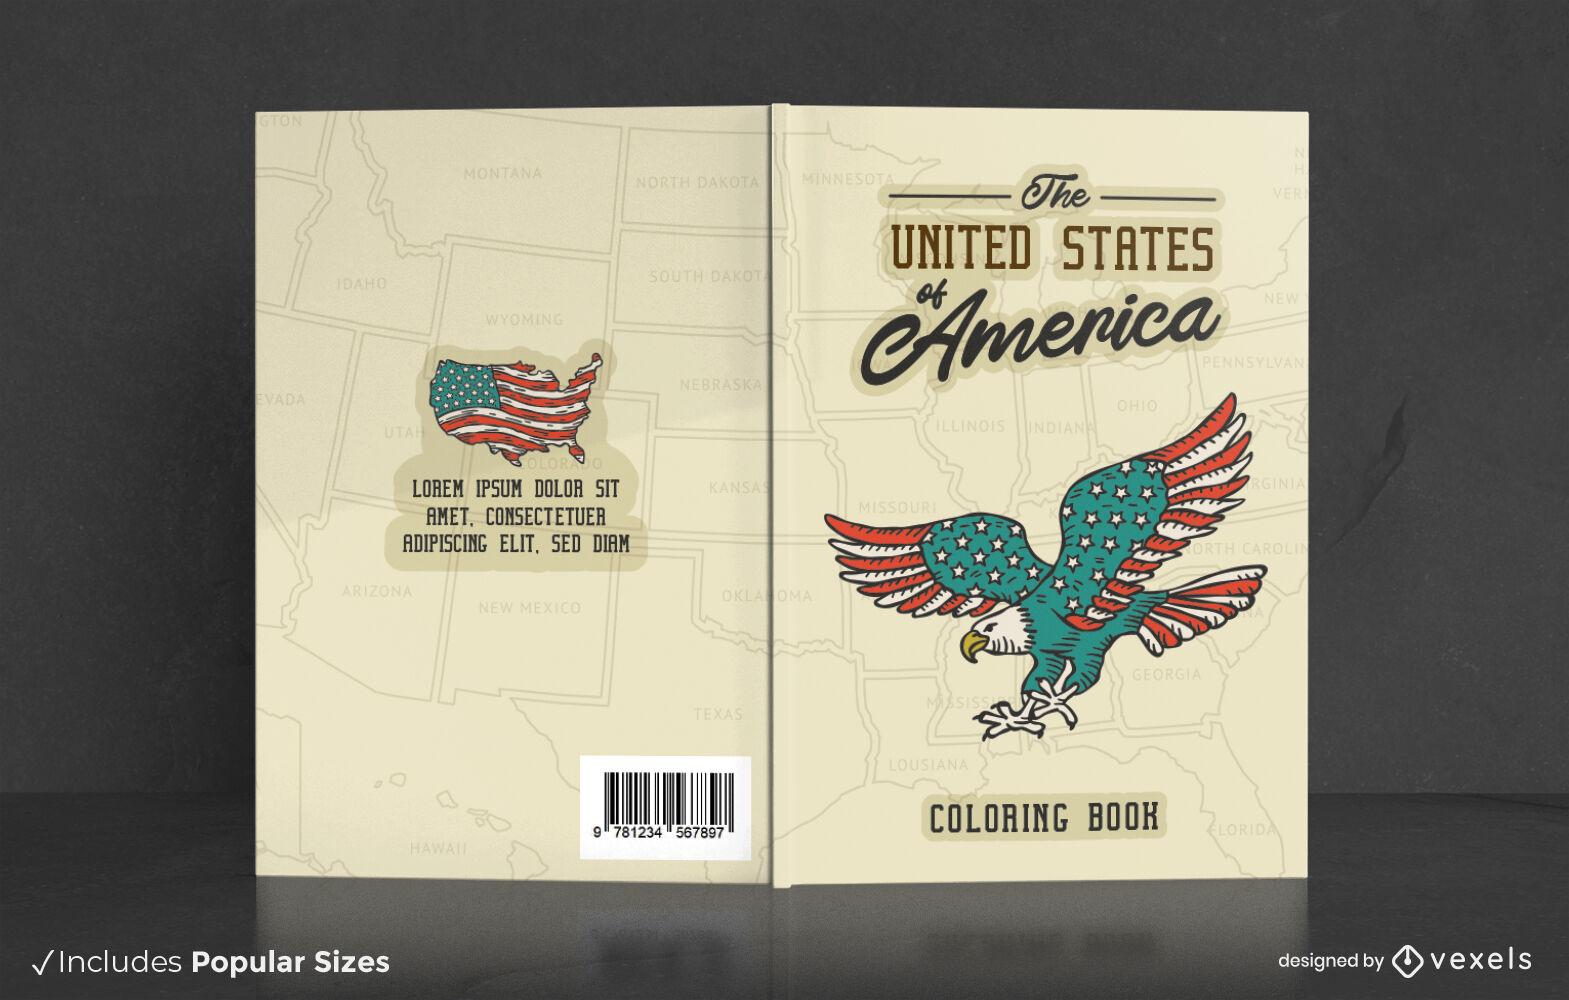 USA coloring book cover design